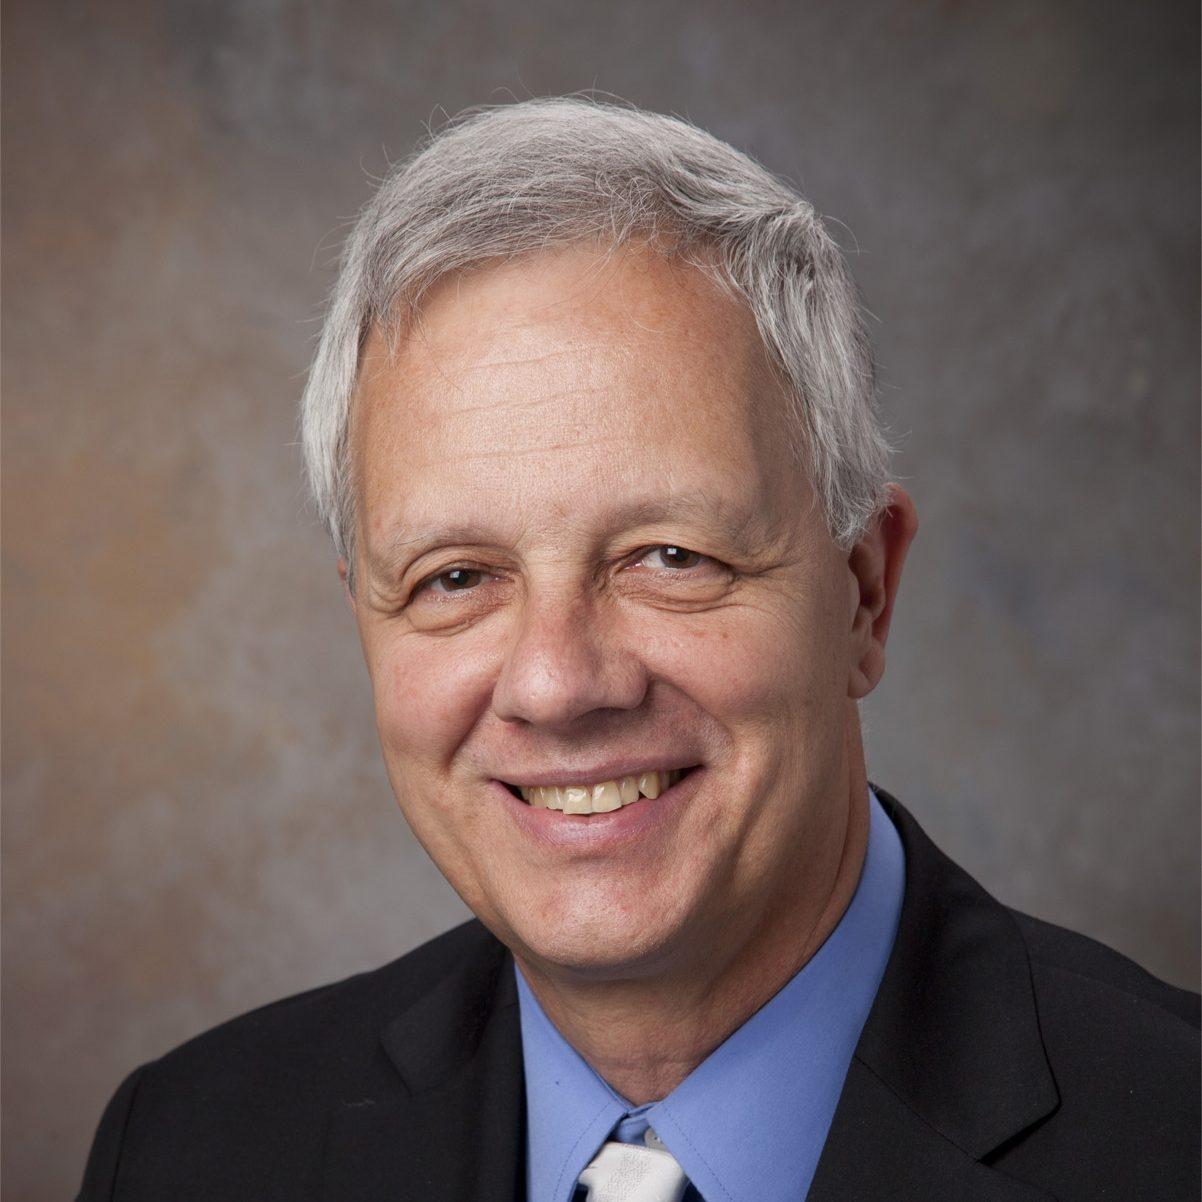 Dr. Joseph Paul Eder